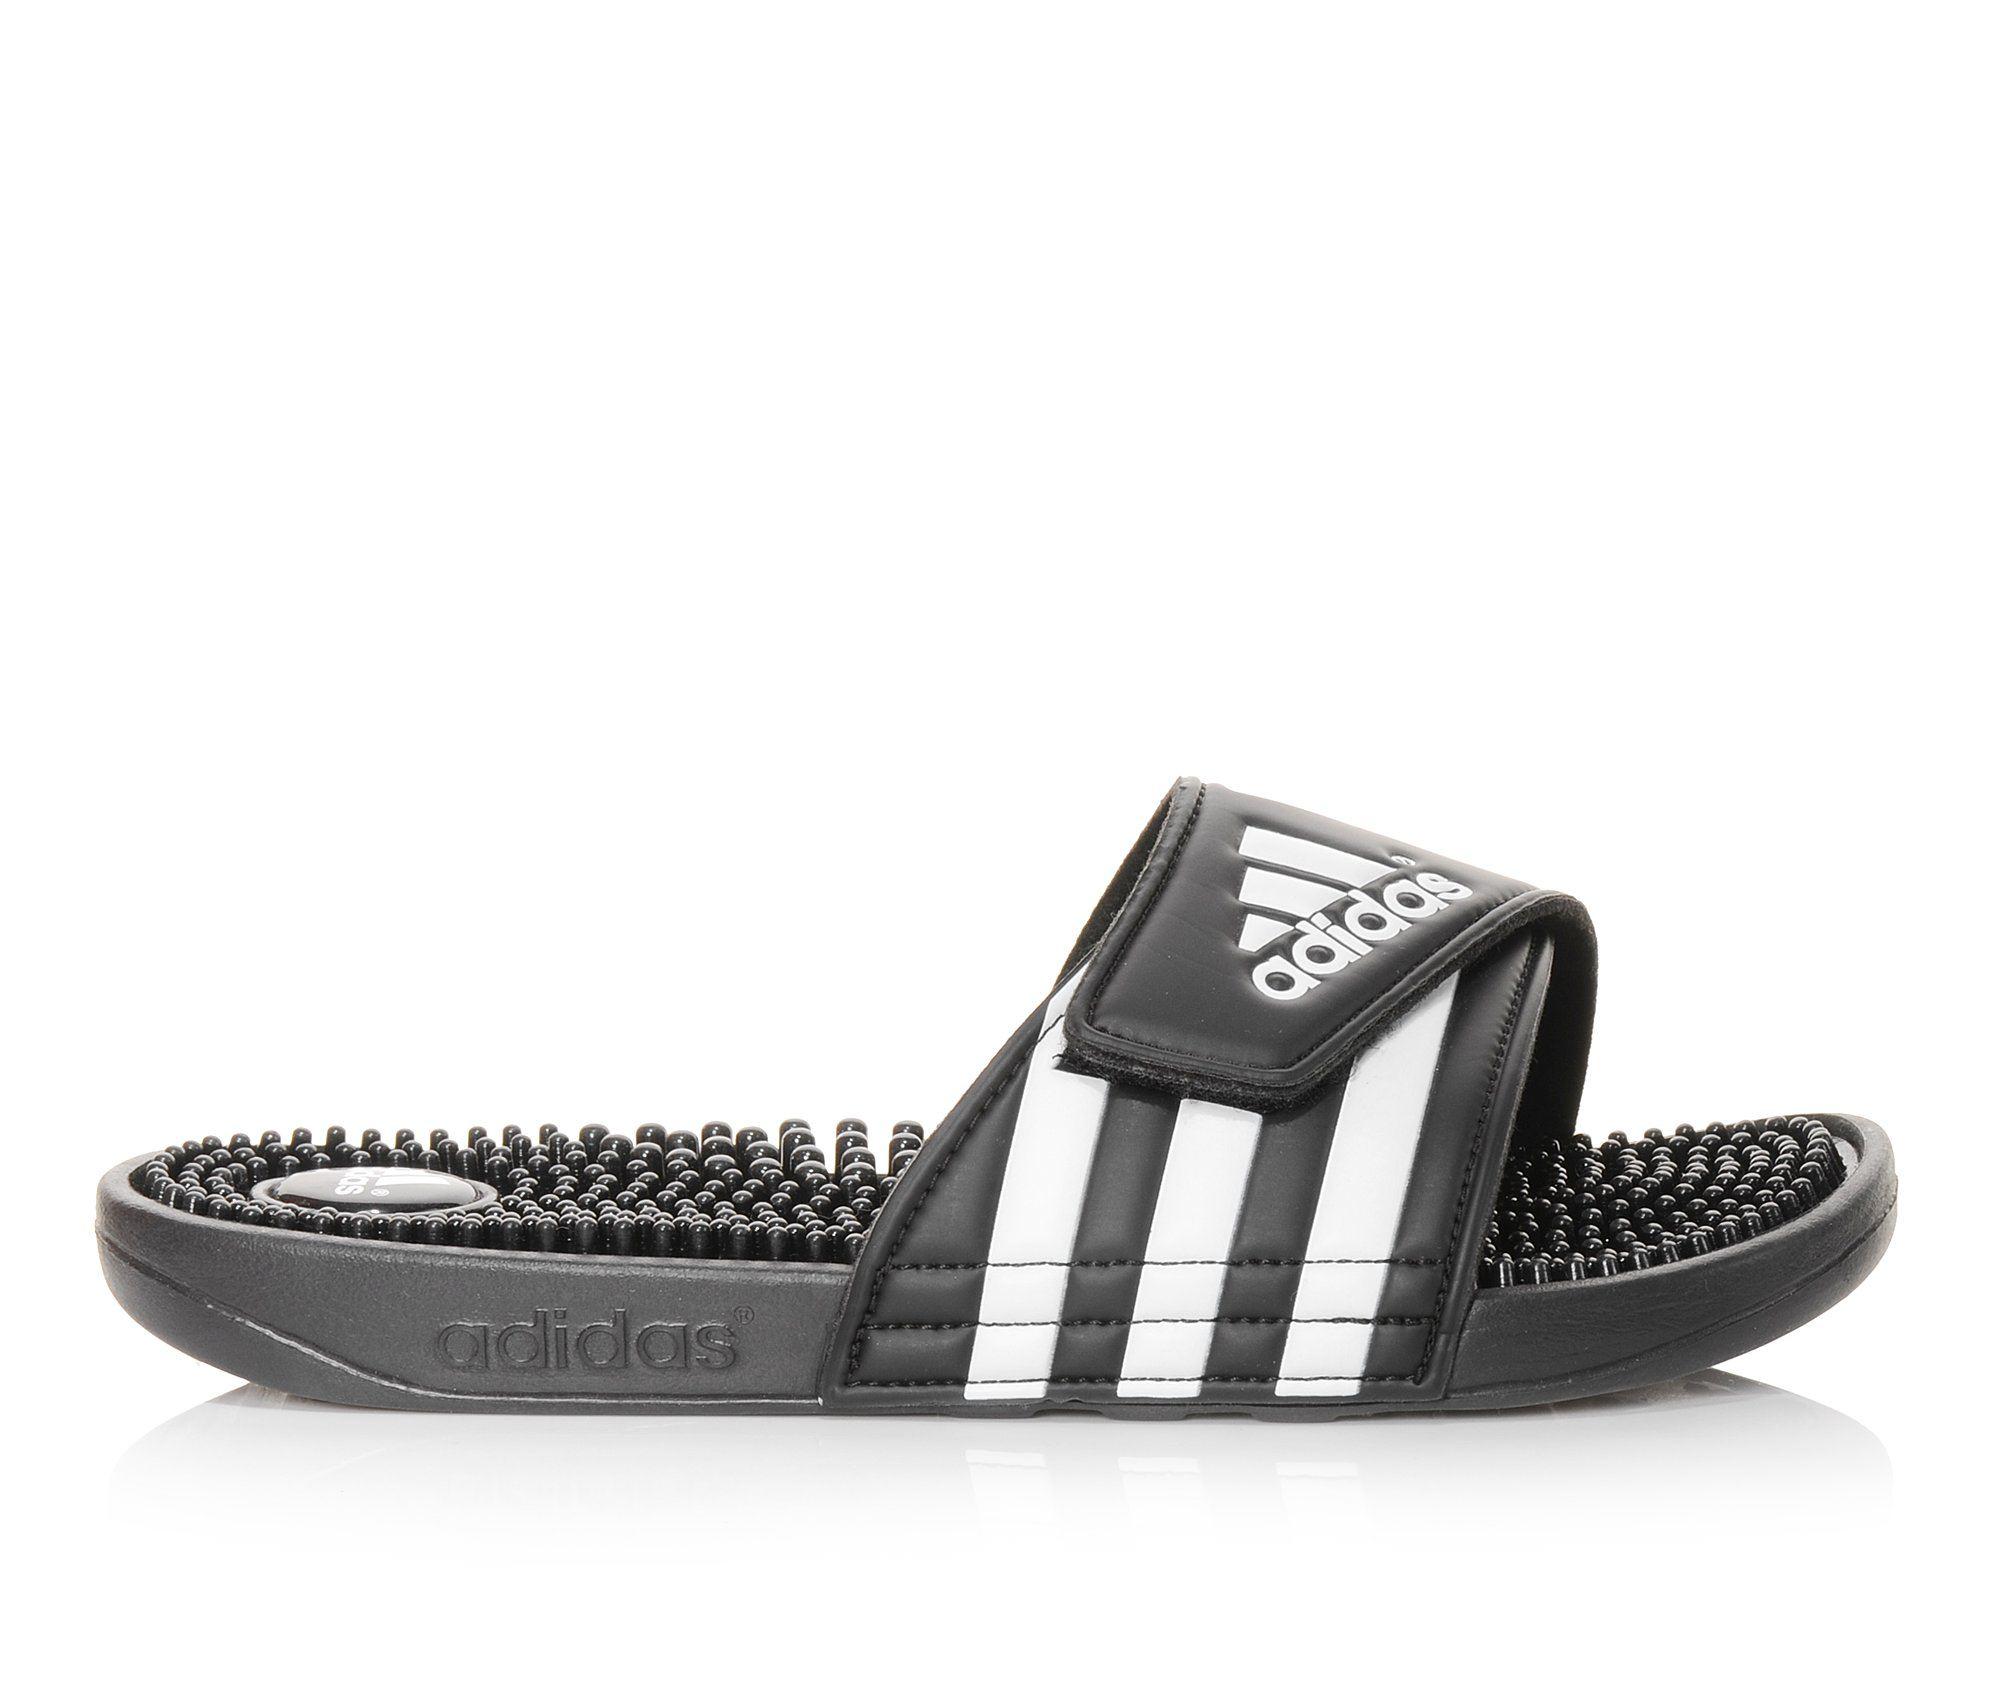 Women's Adidas Adissage Sport Slides (Black)